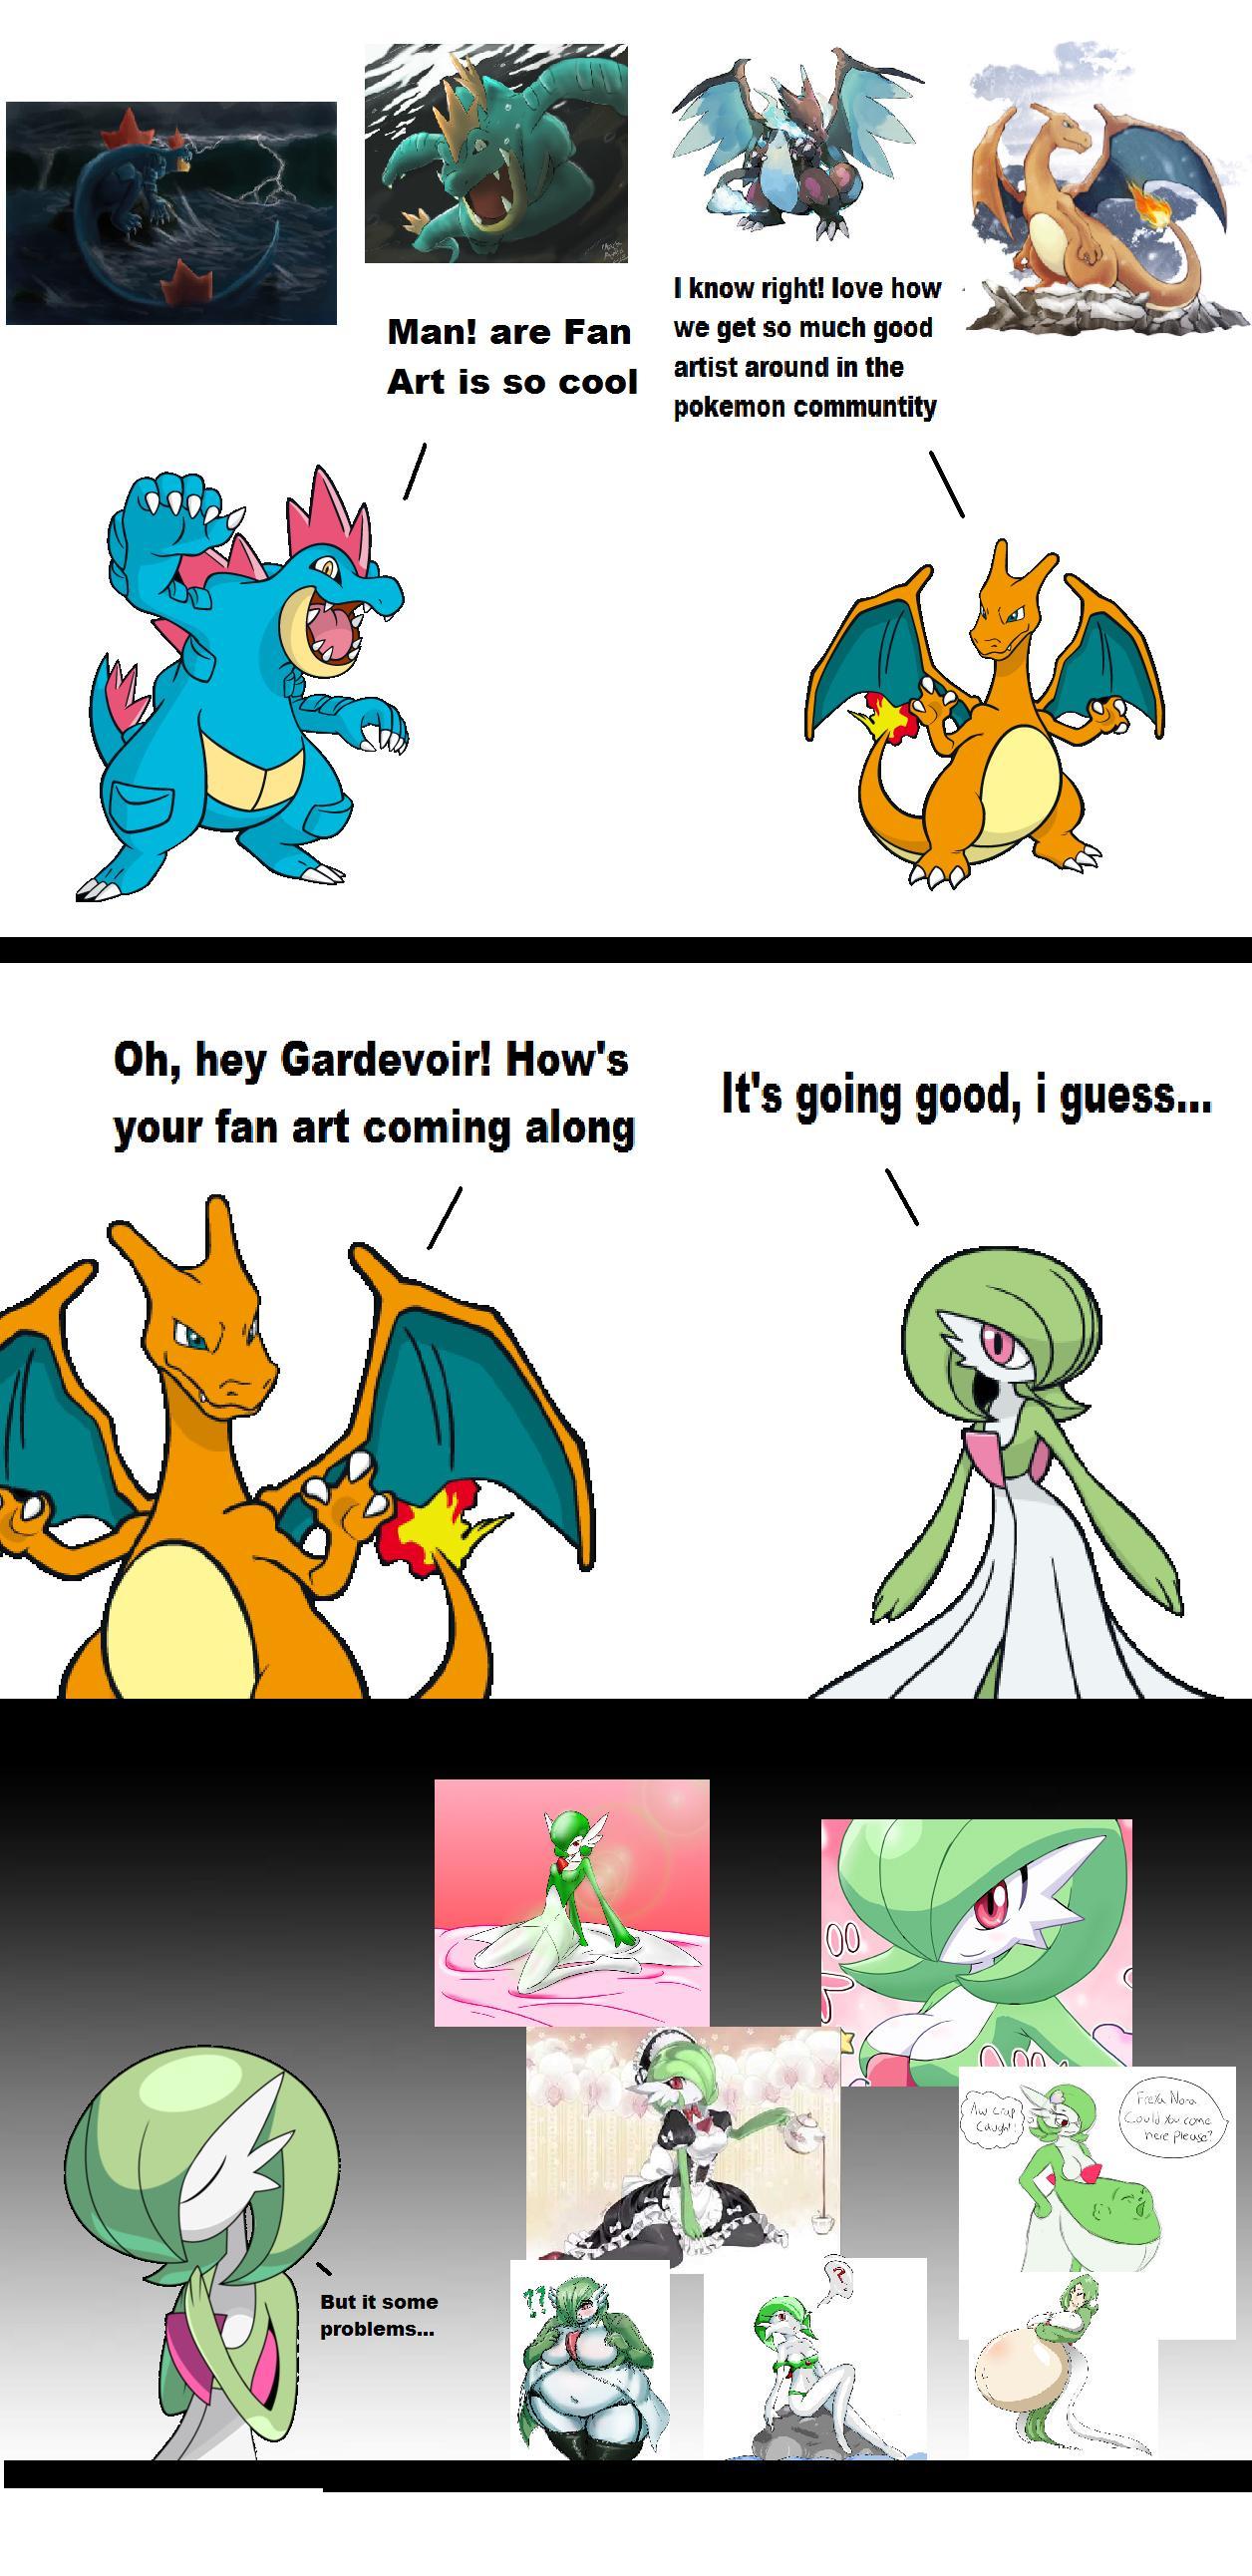 [Image - 843199] | Pokemon | Know Your Meme